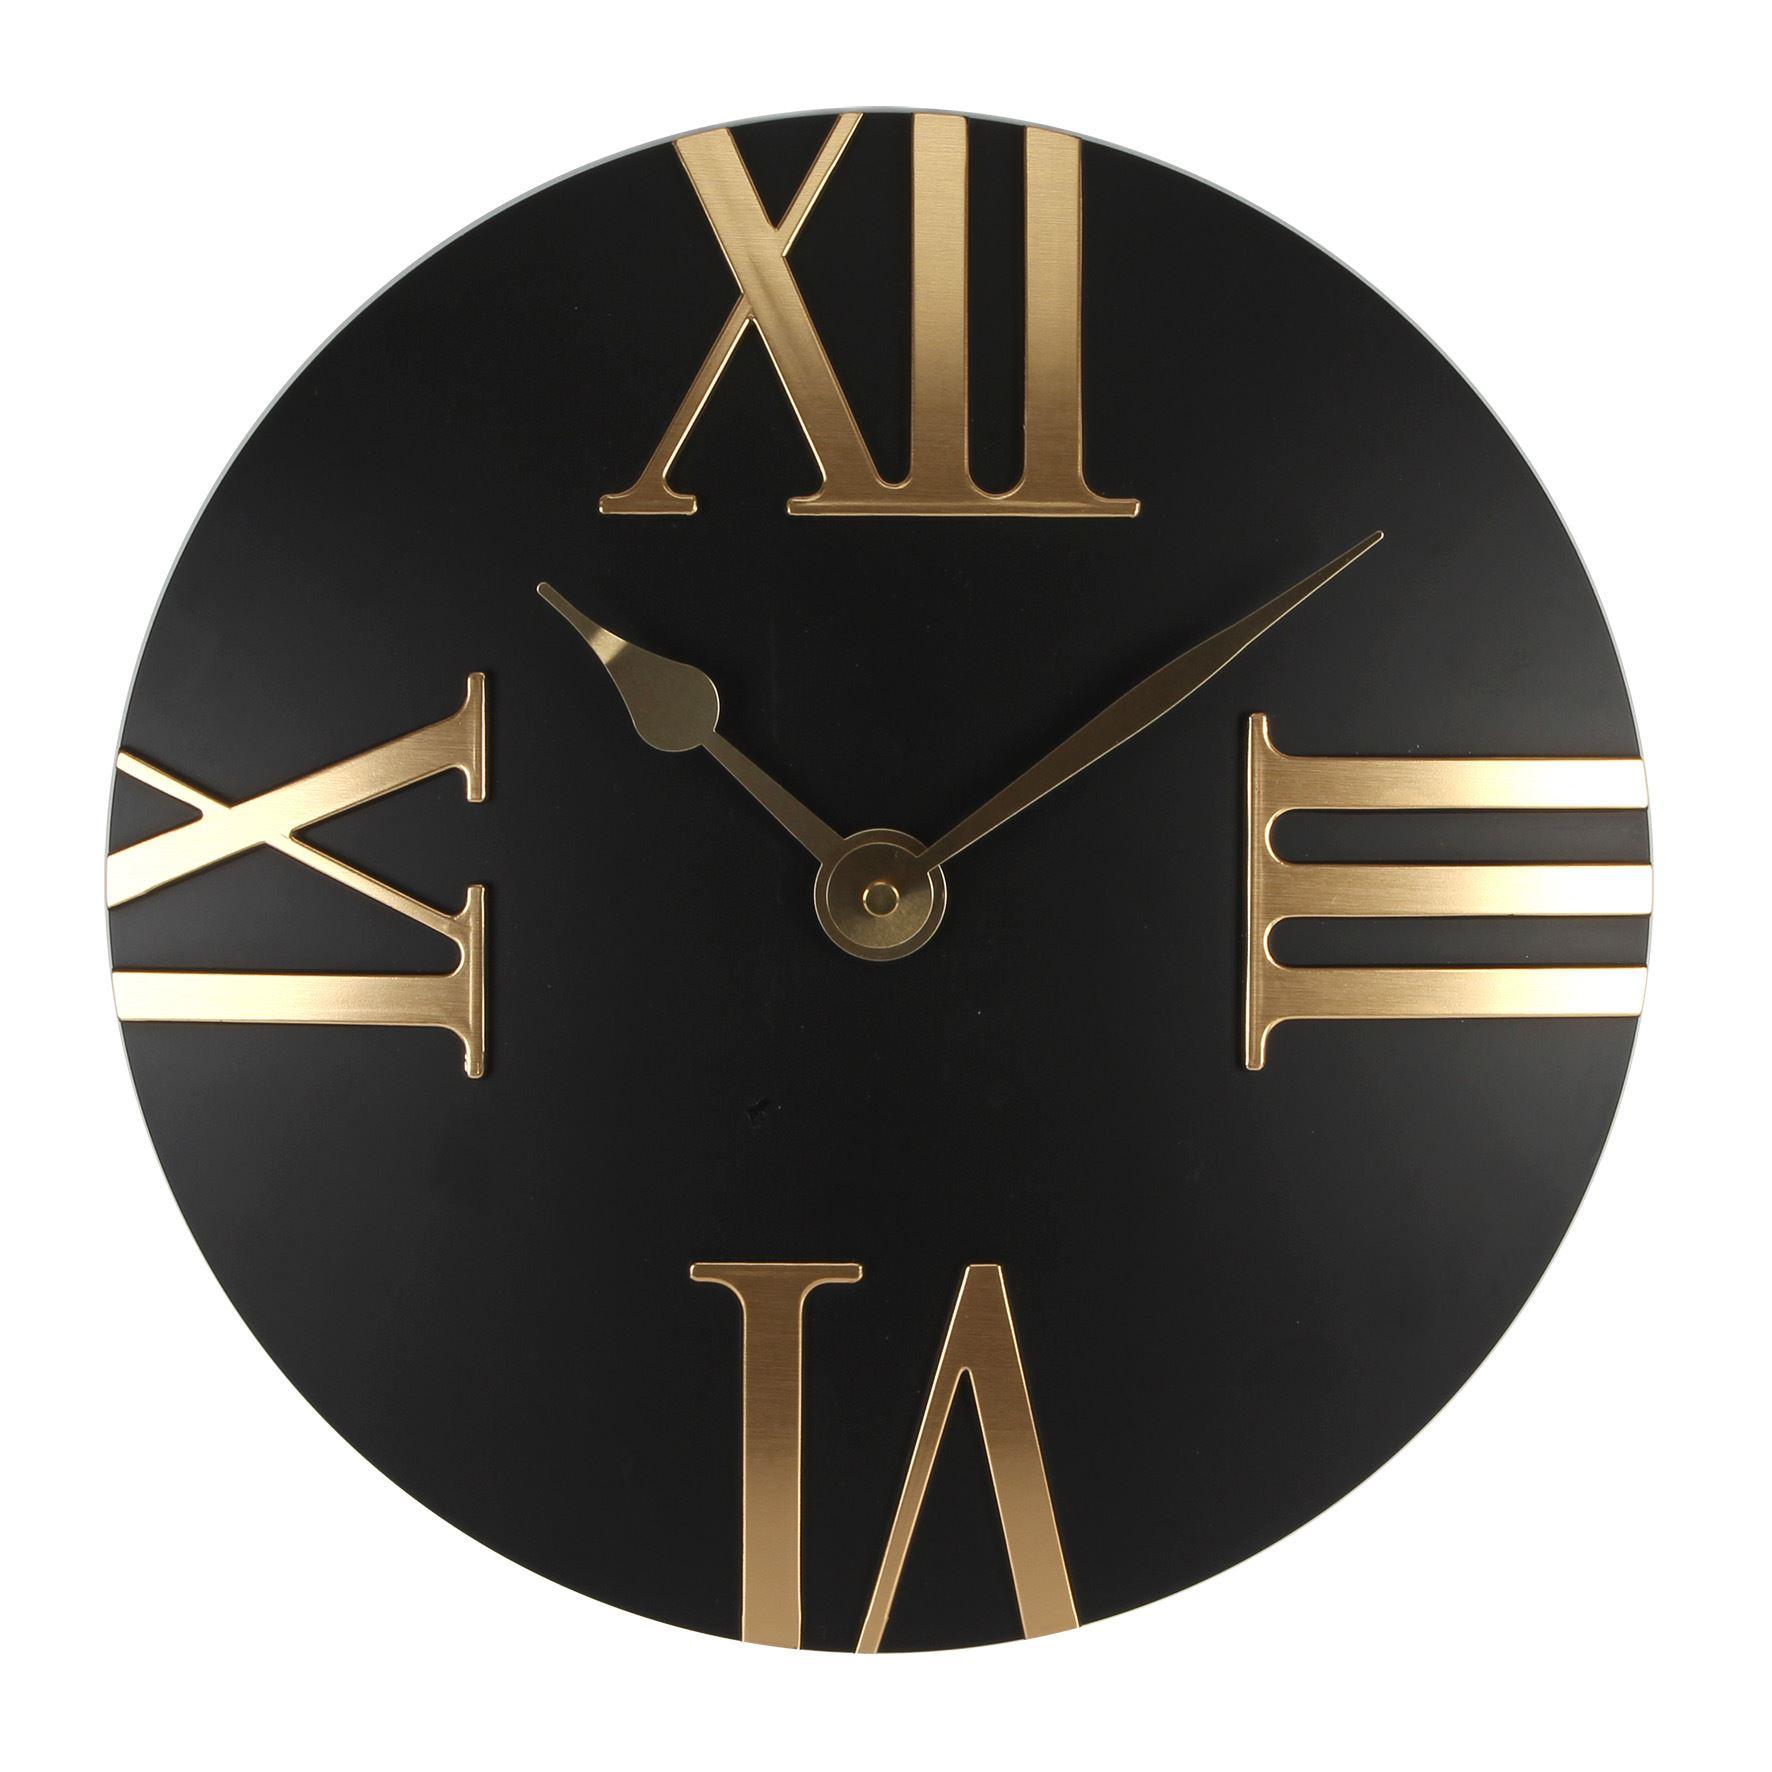 Hometime Wall Clock - Domed Roman Quarter Dial - Black